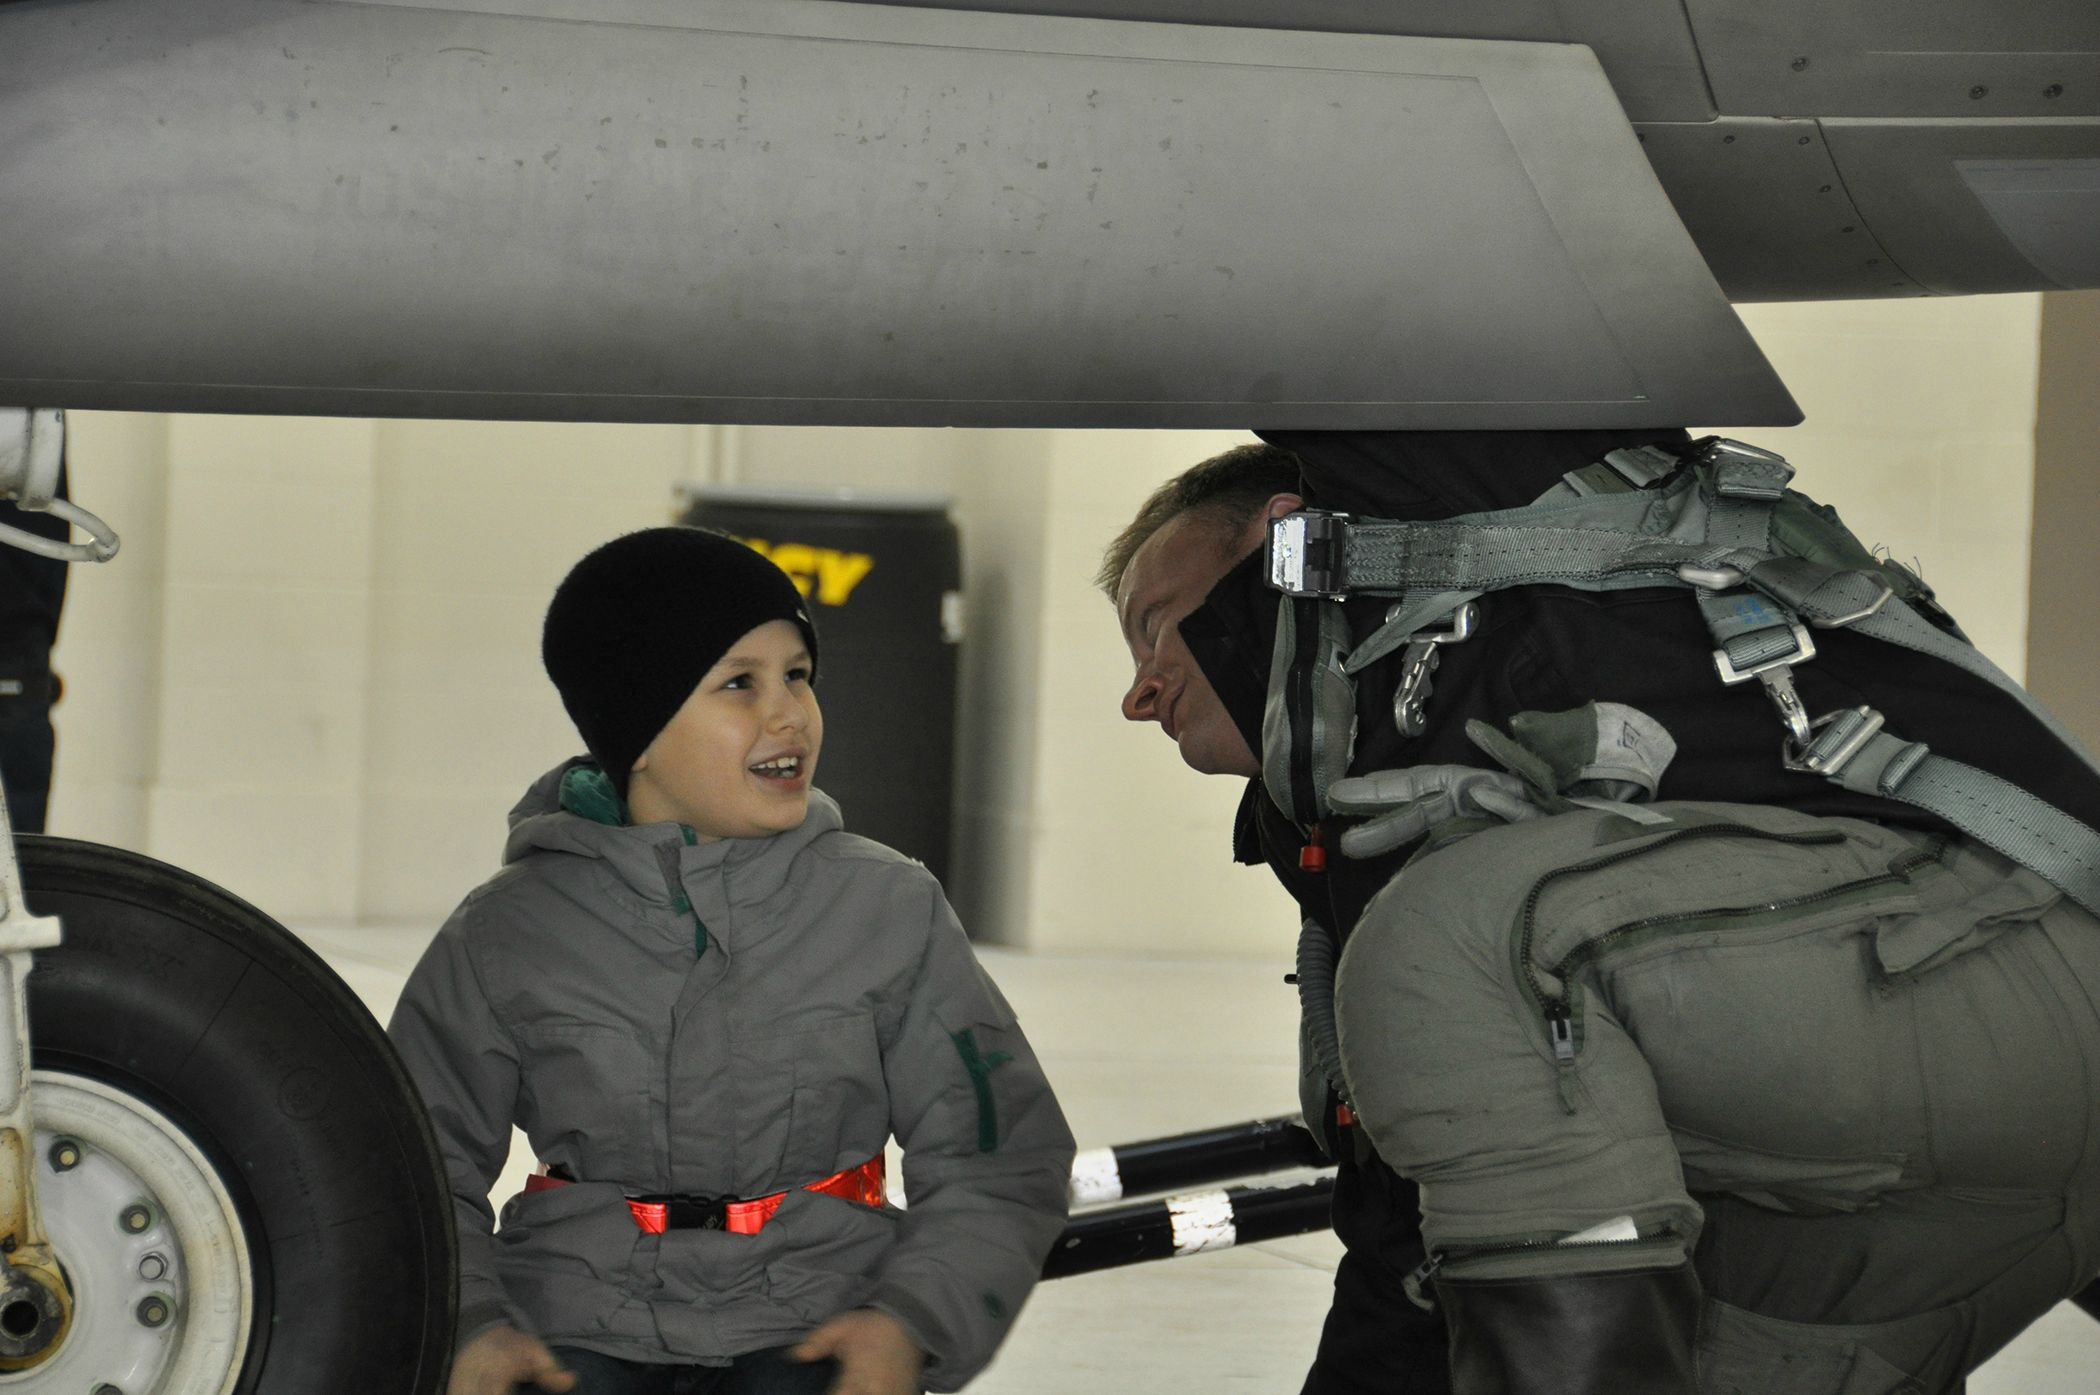 Pilot Delivers Letter To 'Heaven' For Boy's Fallen Soldier